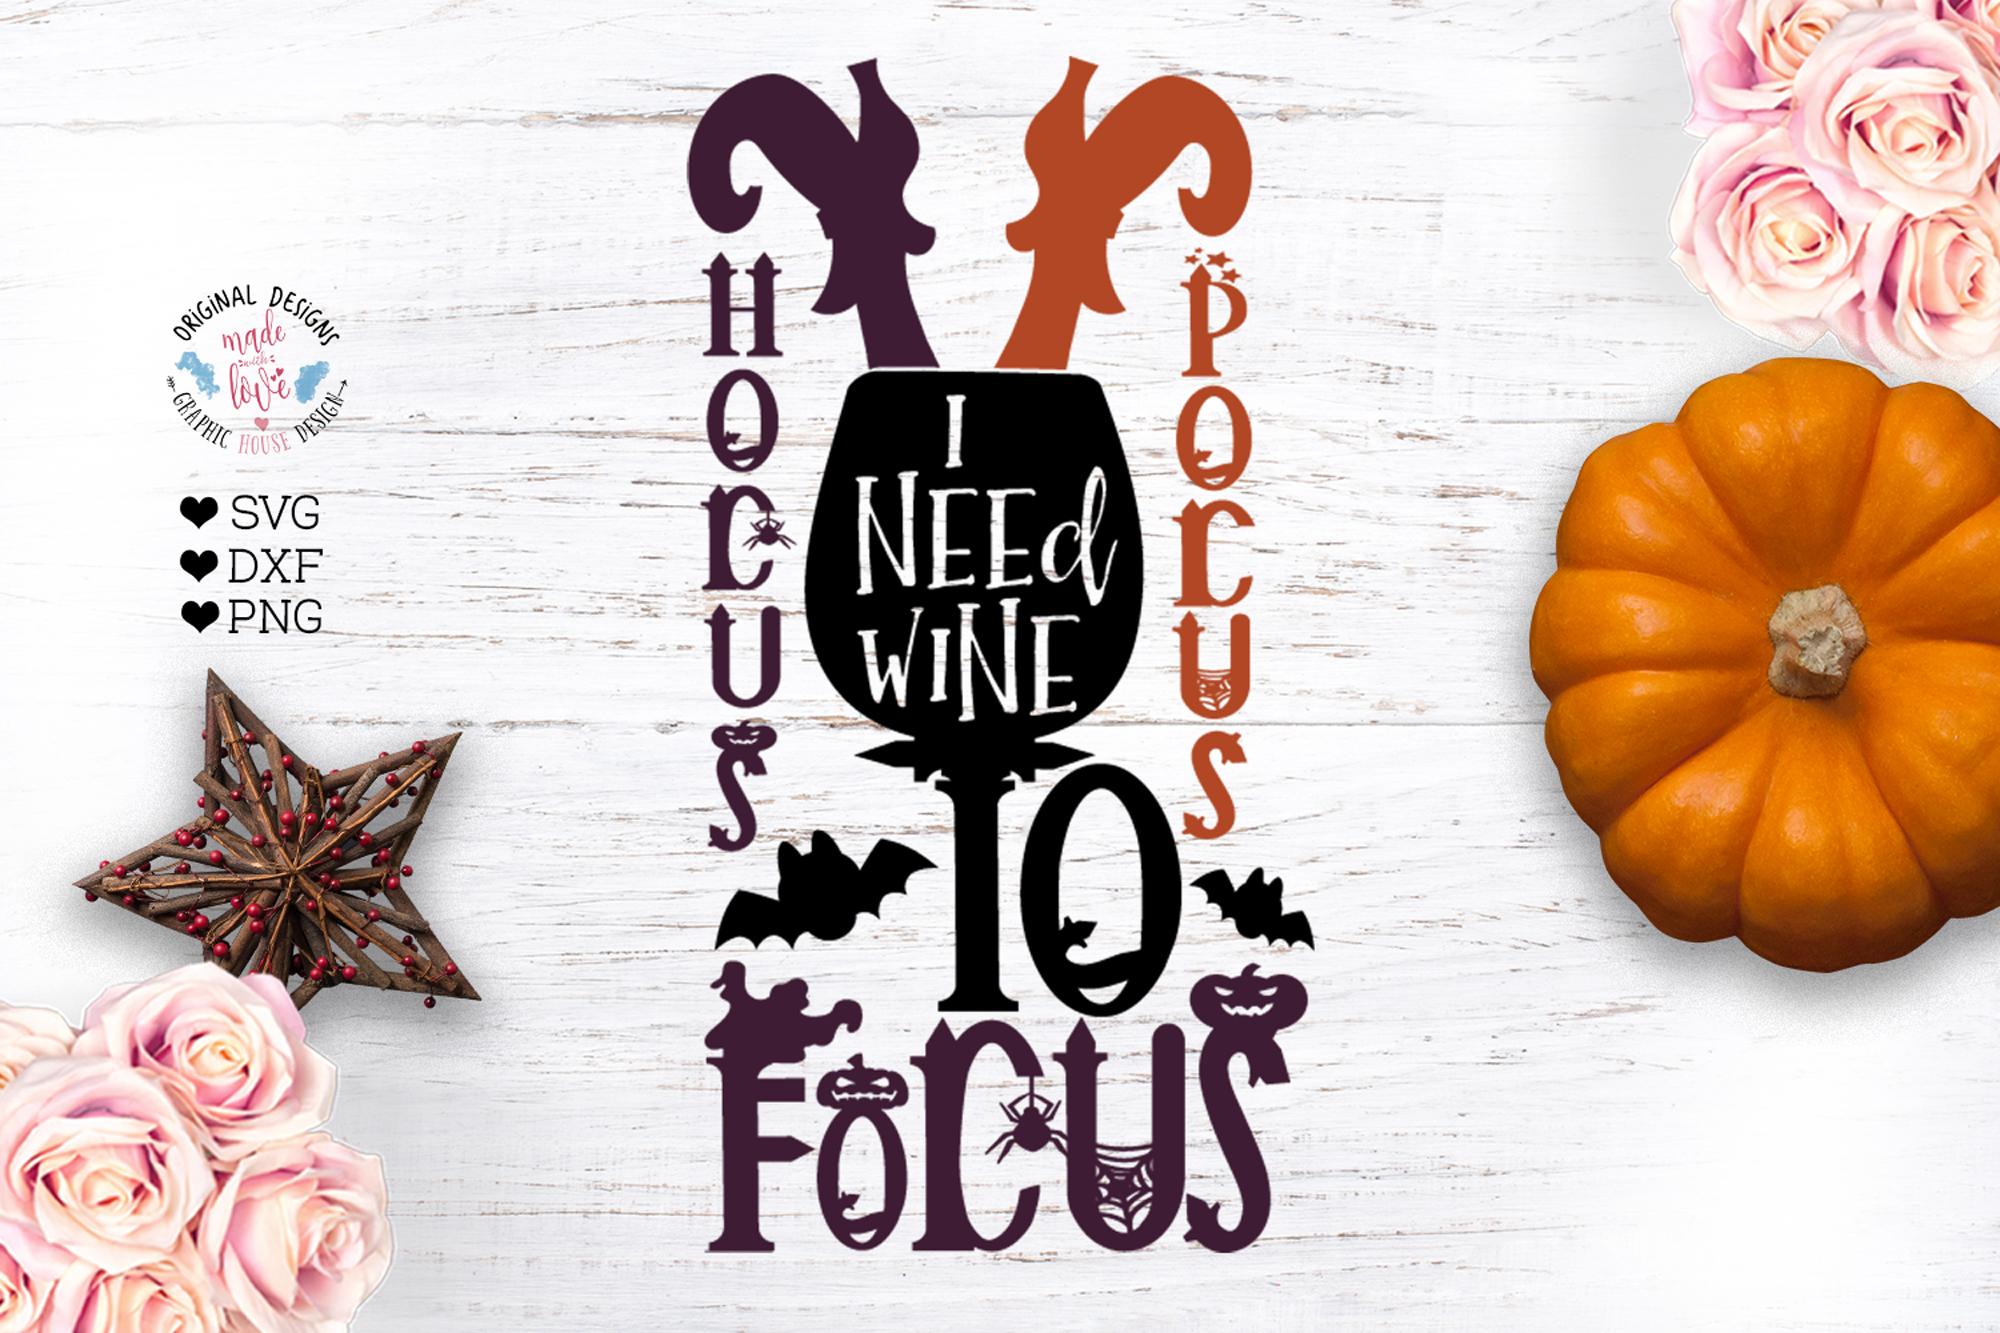 Hocus Pocus need wine to focus - Halloween Cut File example image 1